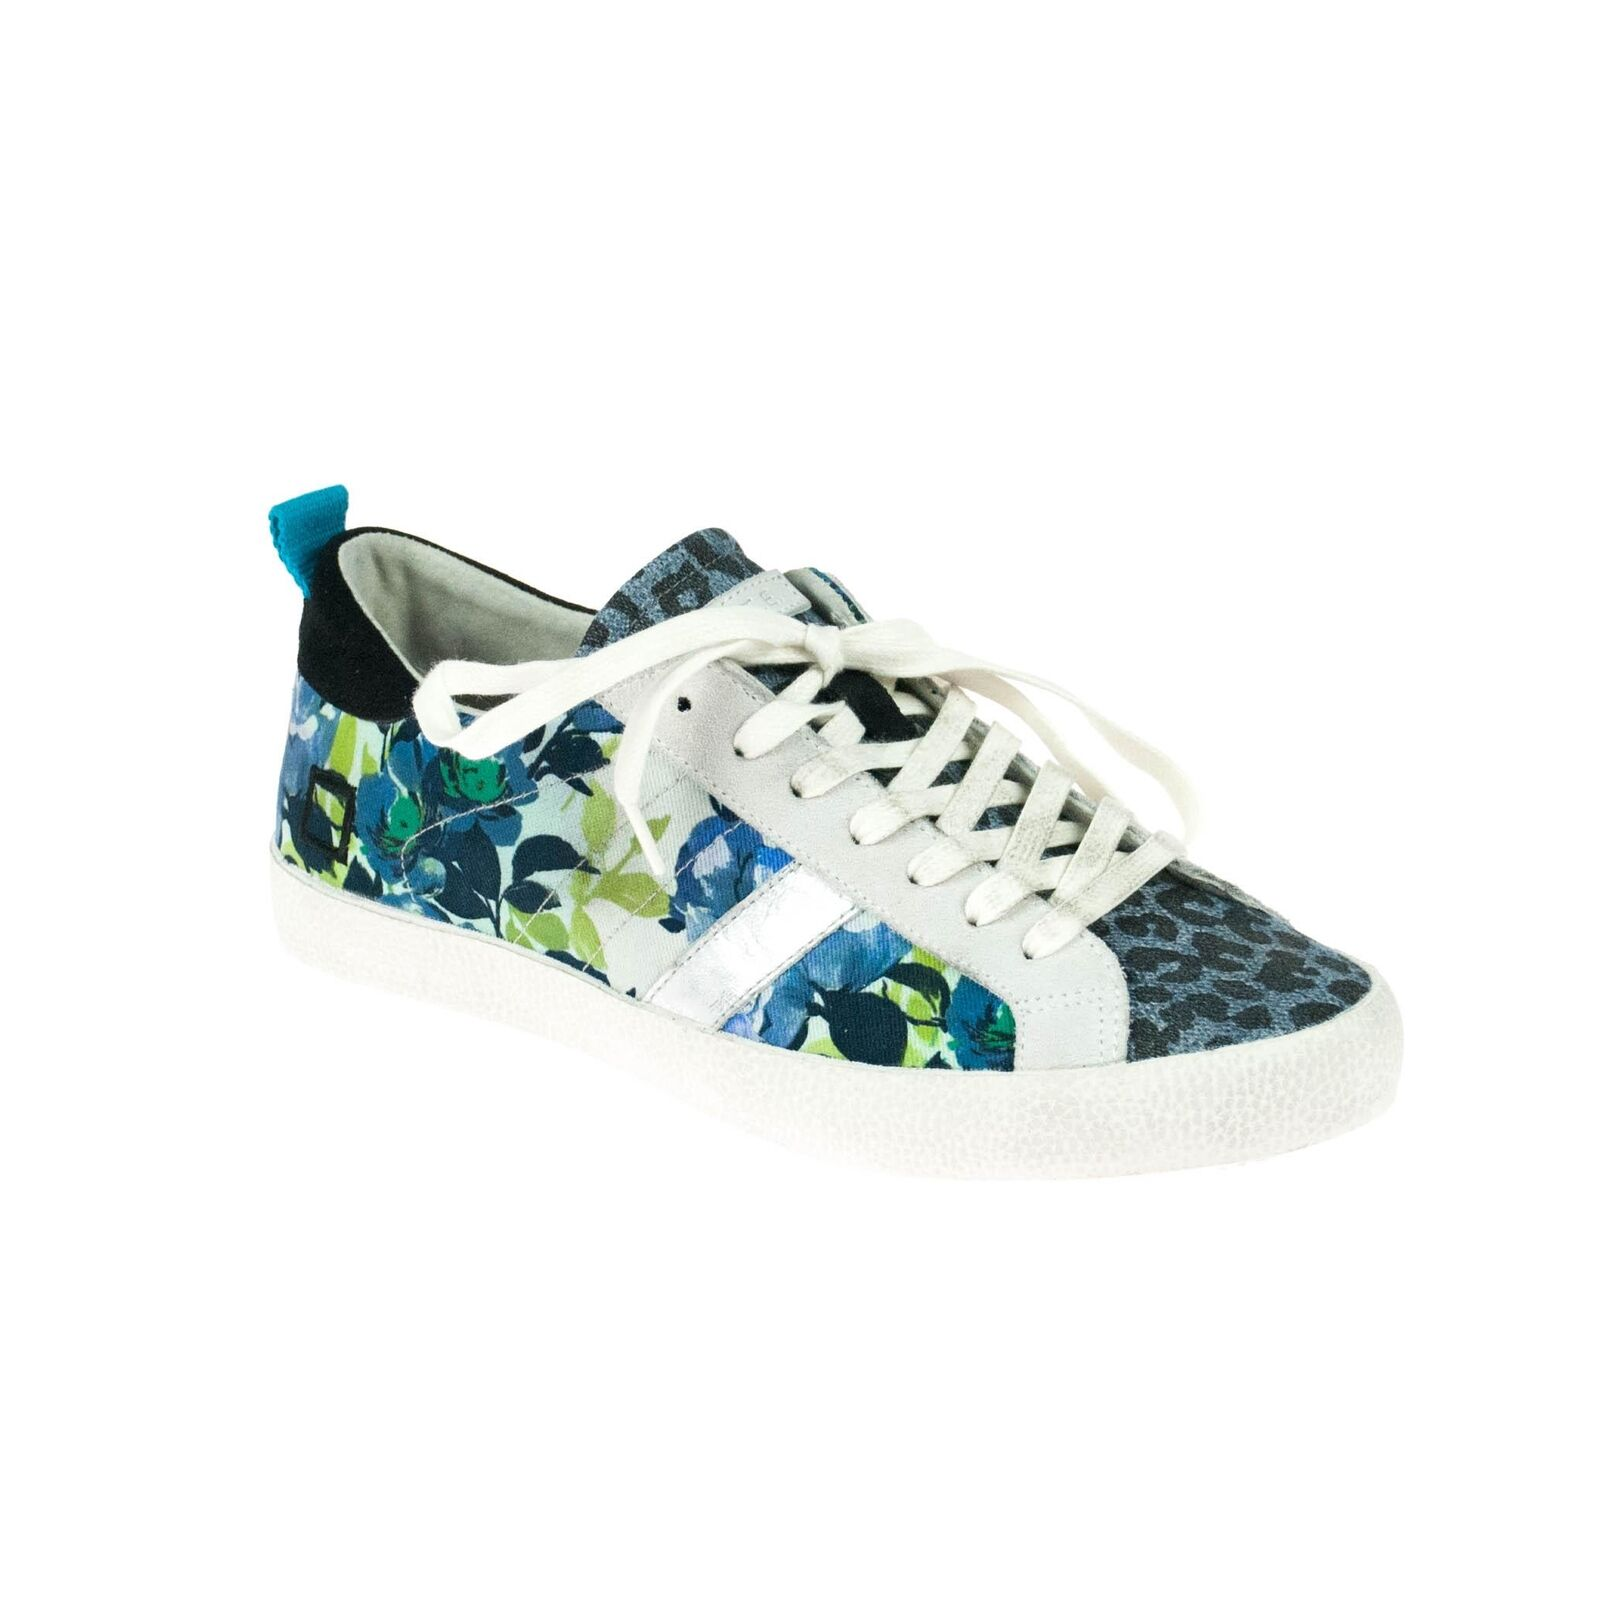 Date Damen Sneaker Blau Grün Weiß Blumenmuster